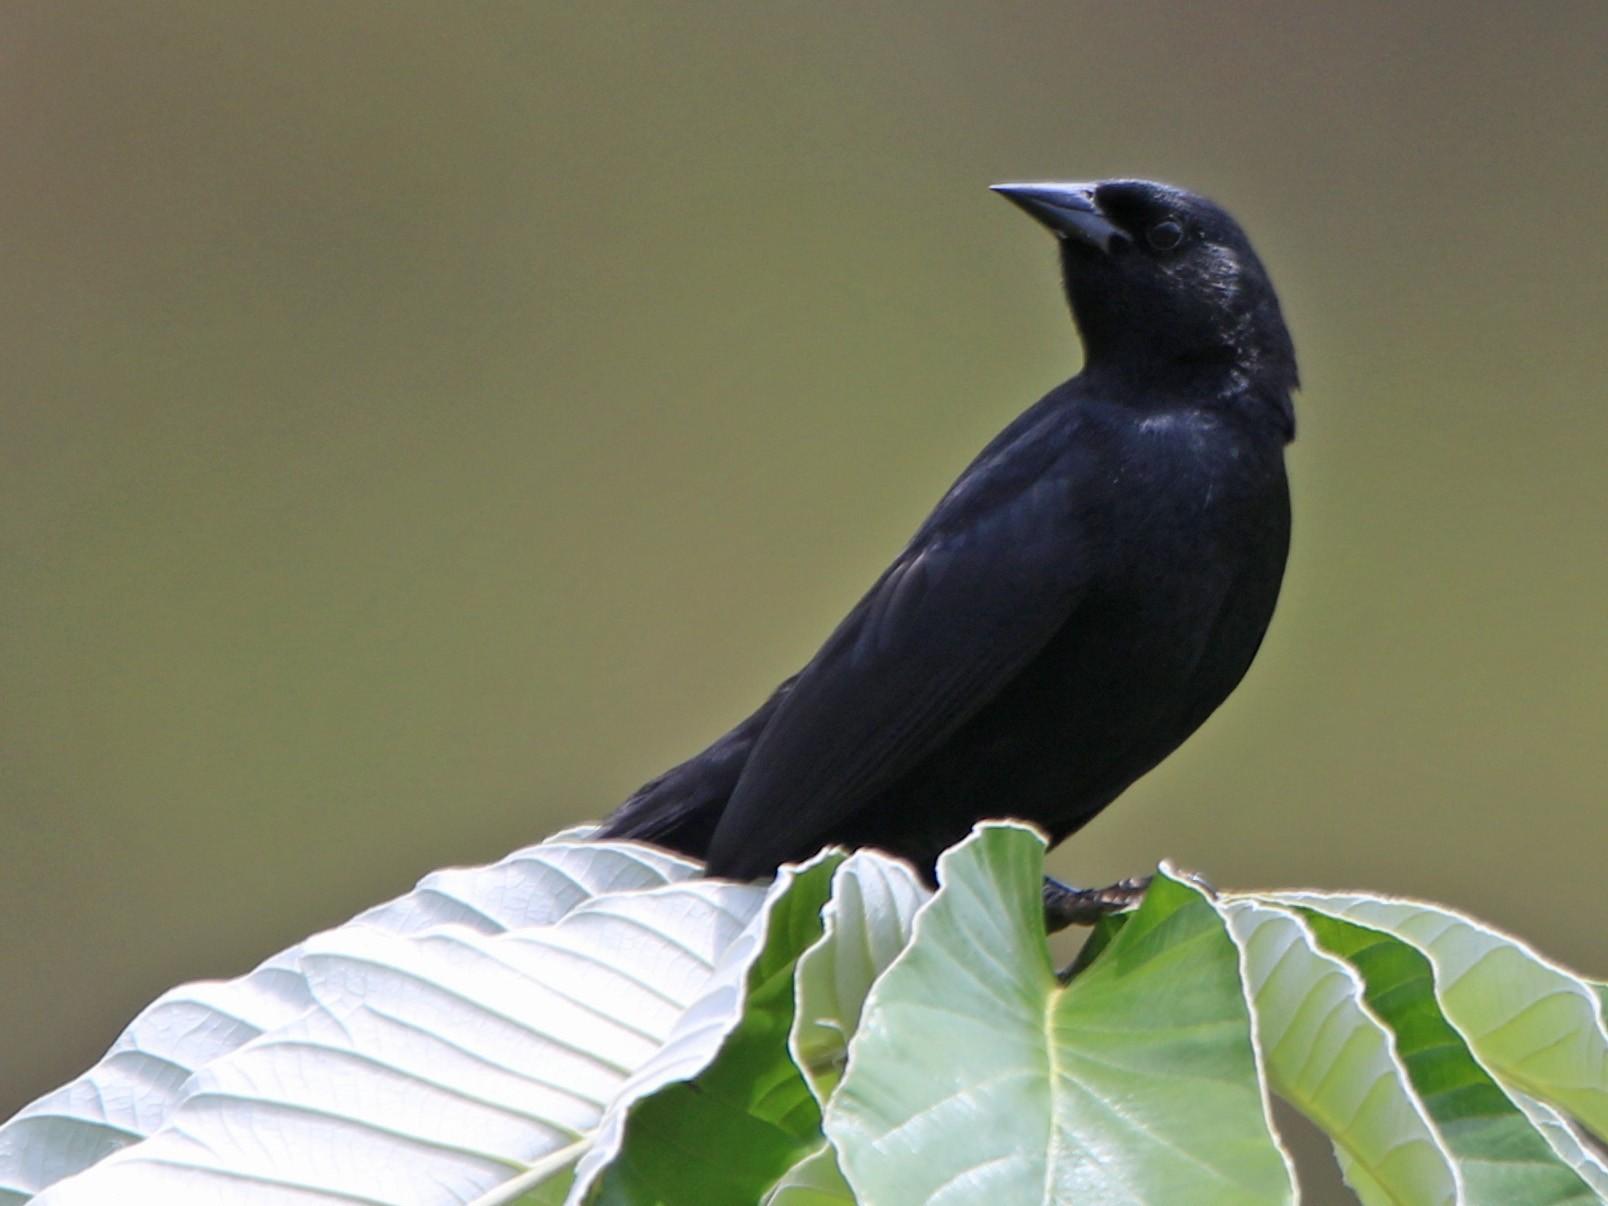 Unicolored Blackbird - Thompson Ian